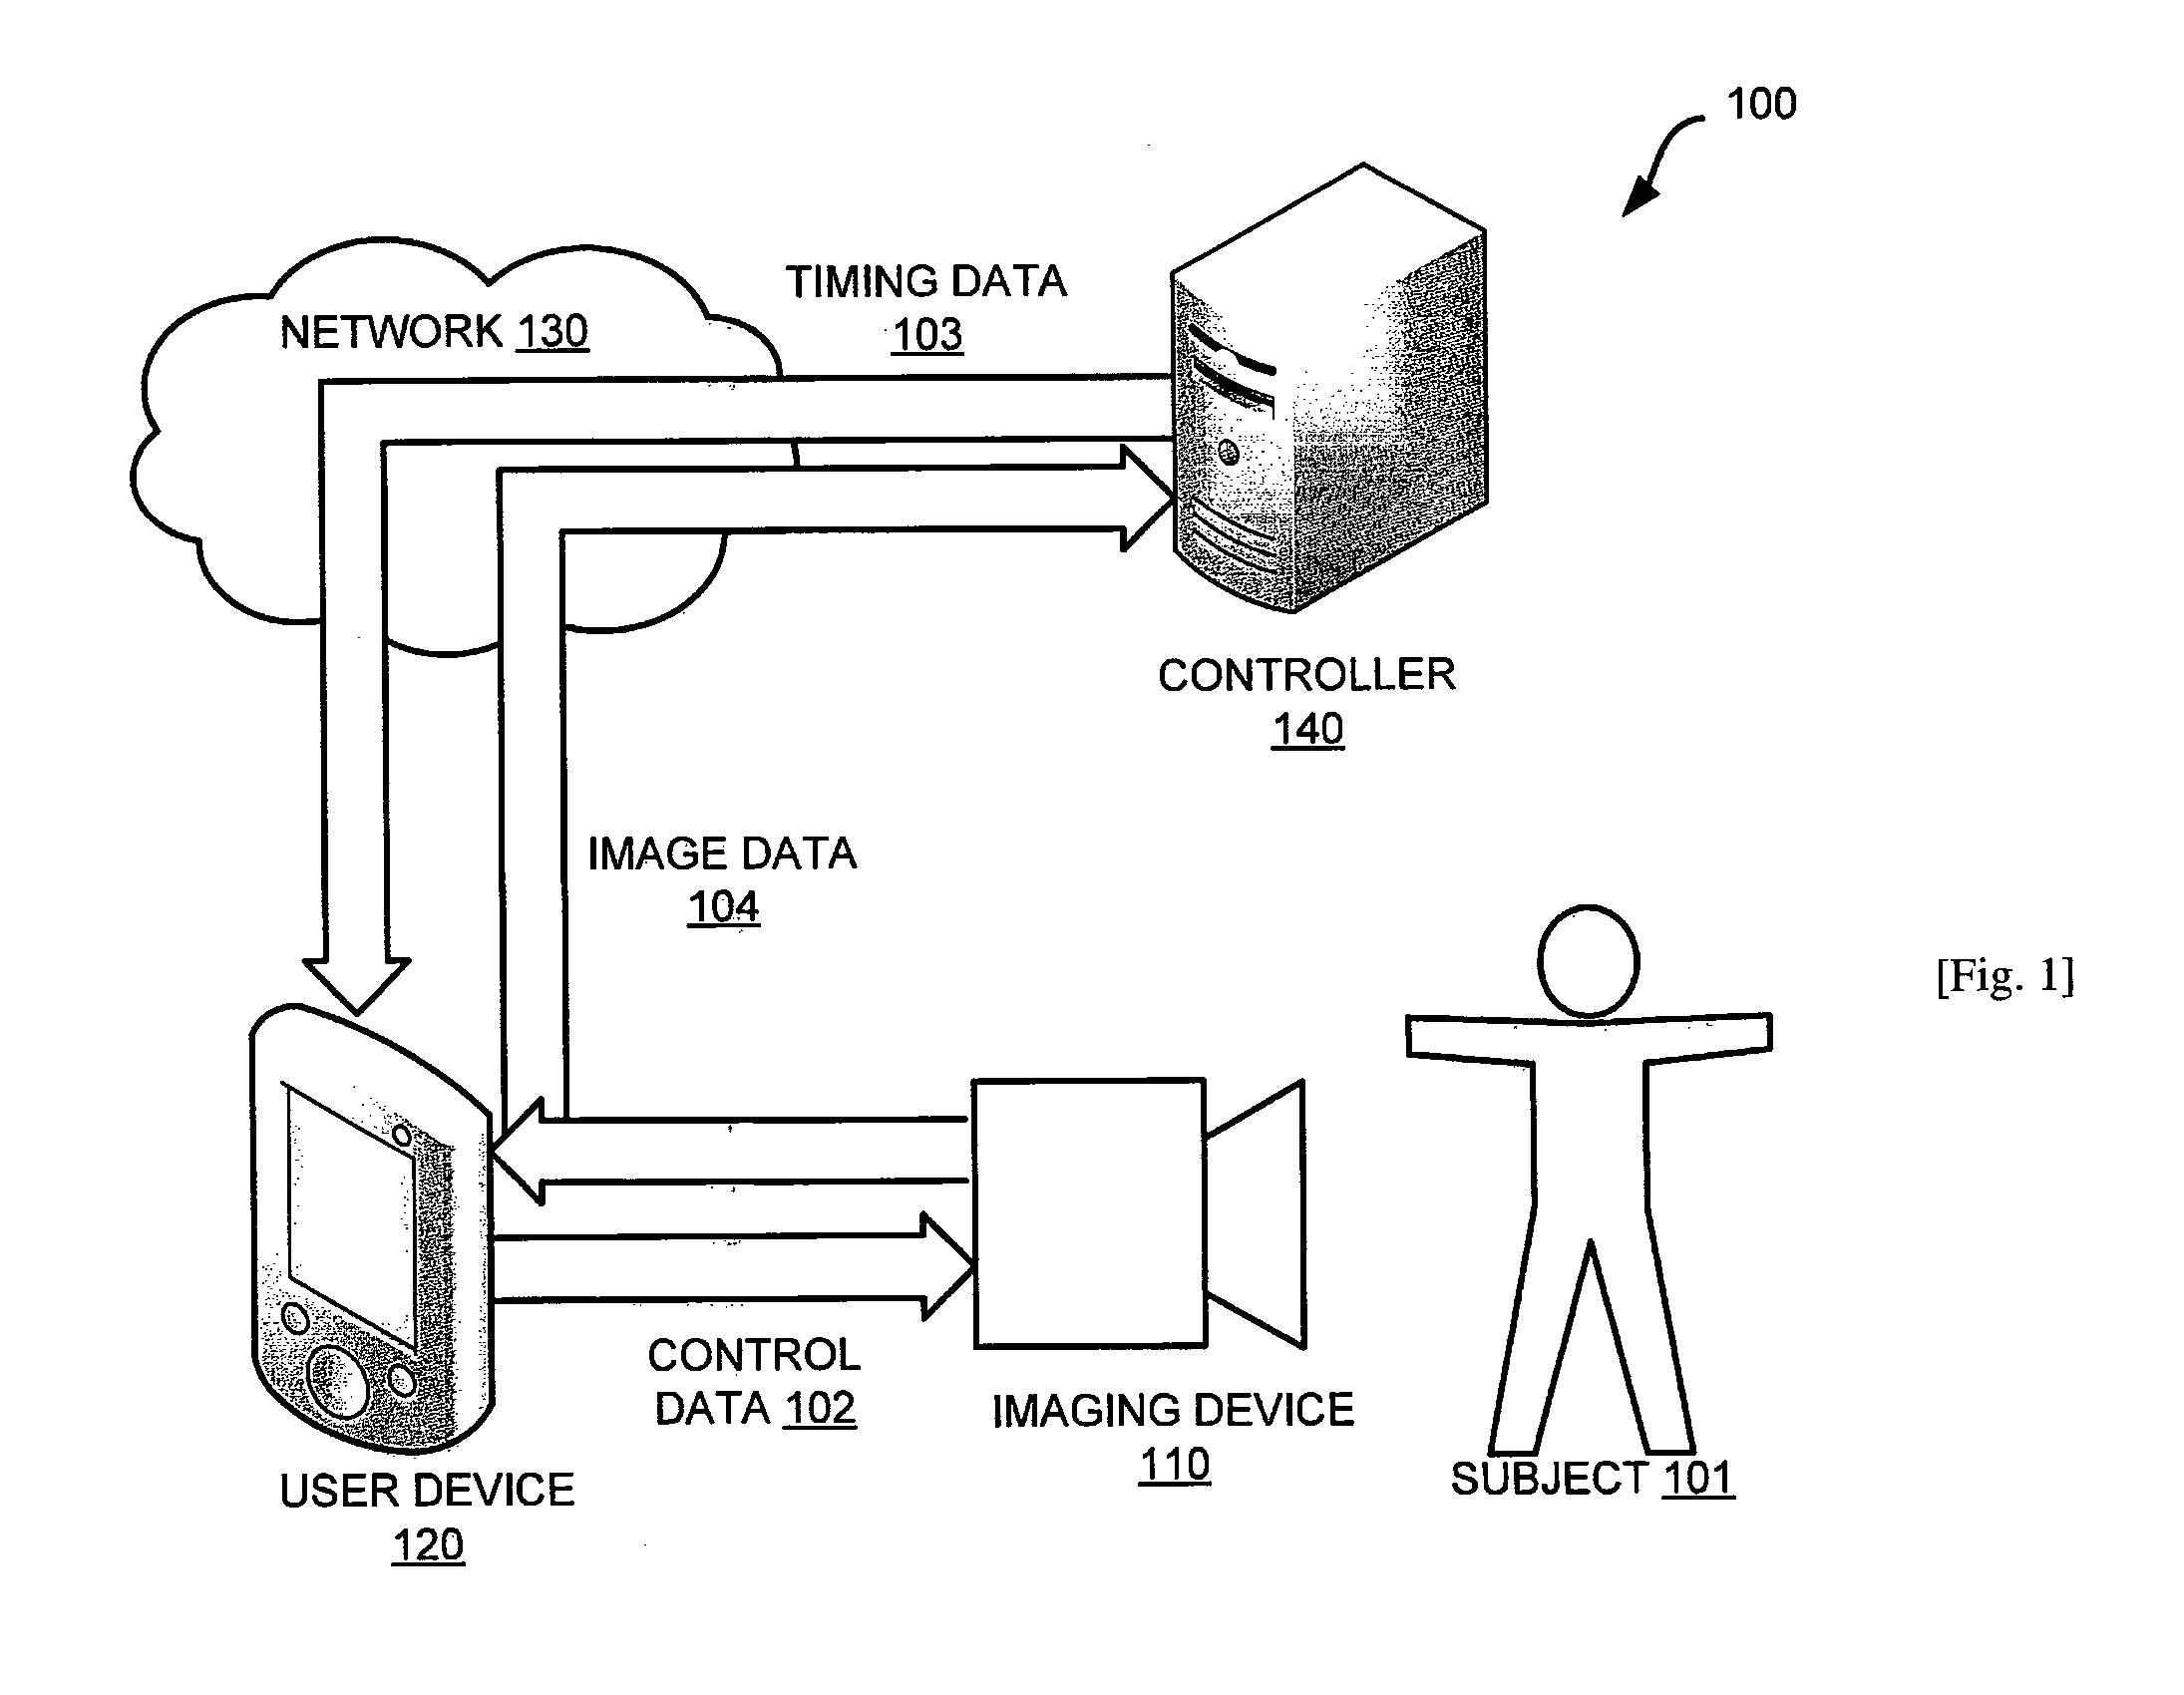 картинка к патенту Sony о непрерывном селфи